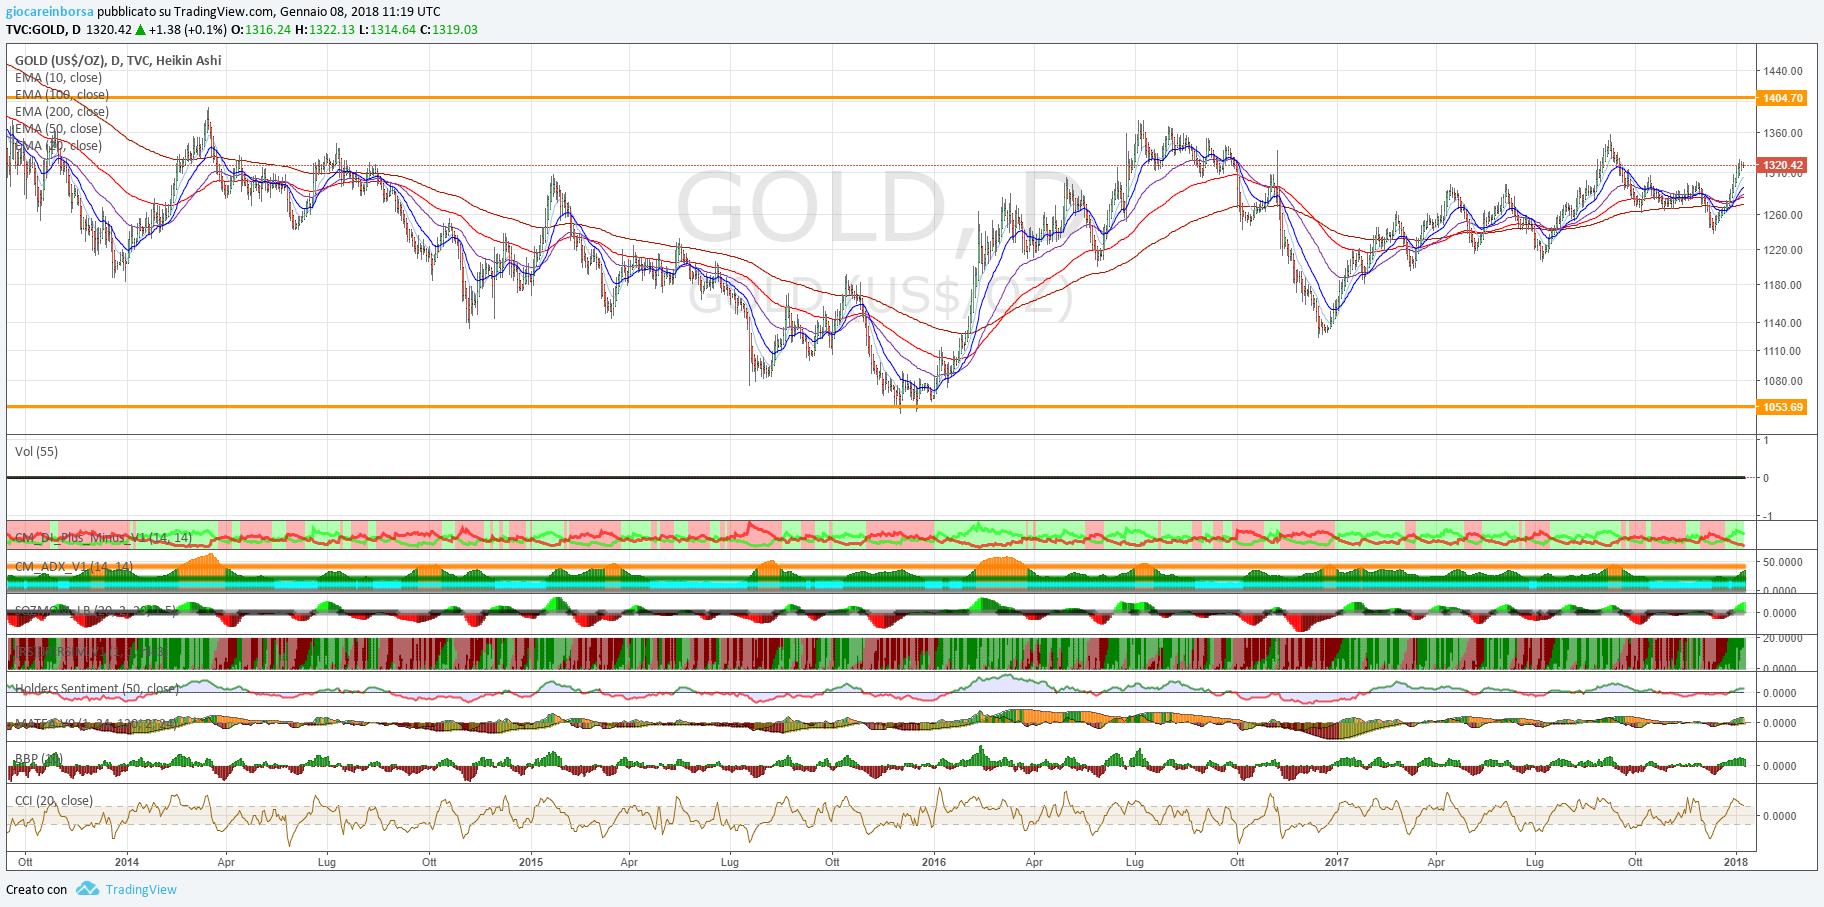 Gold: analisi tecnica al 08 gennaio 2018